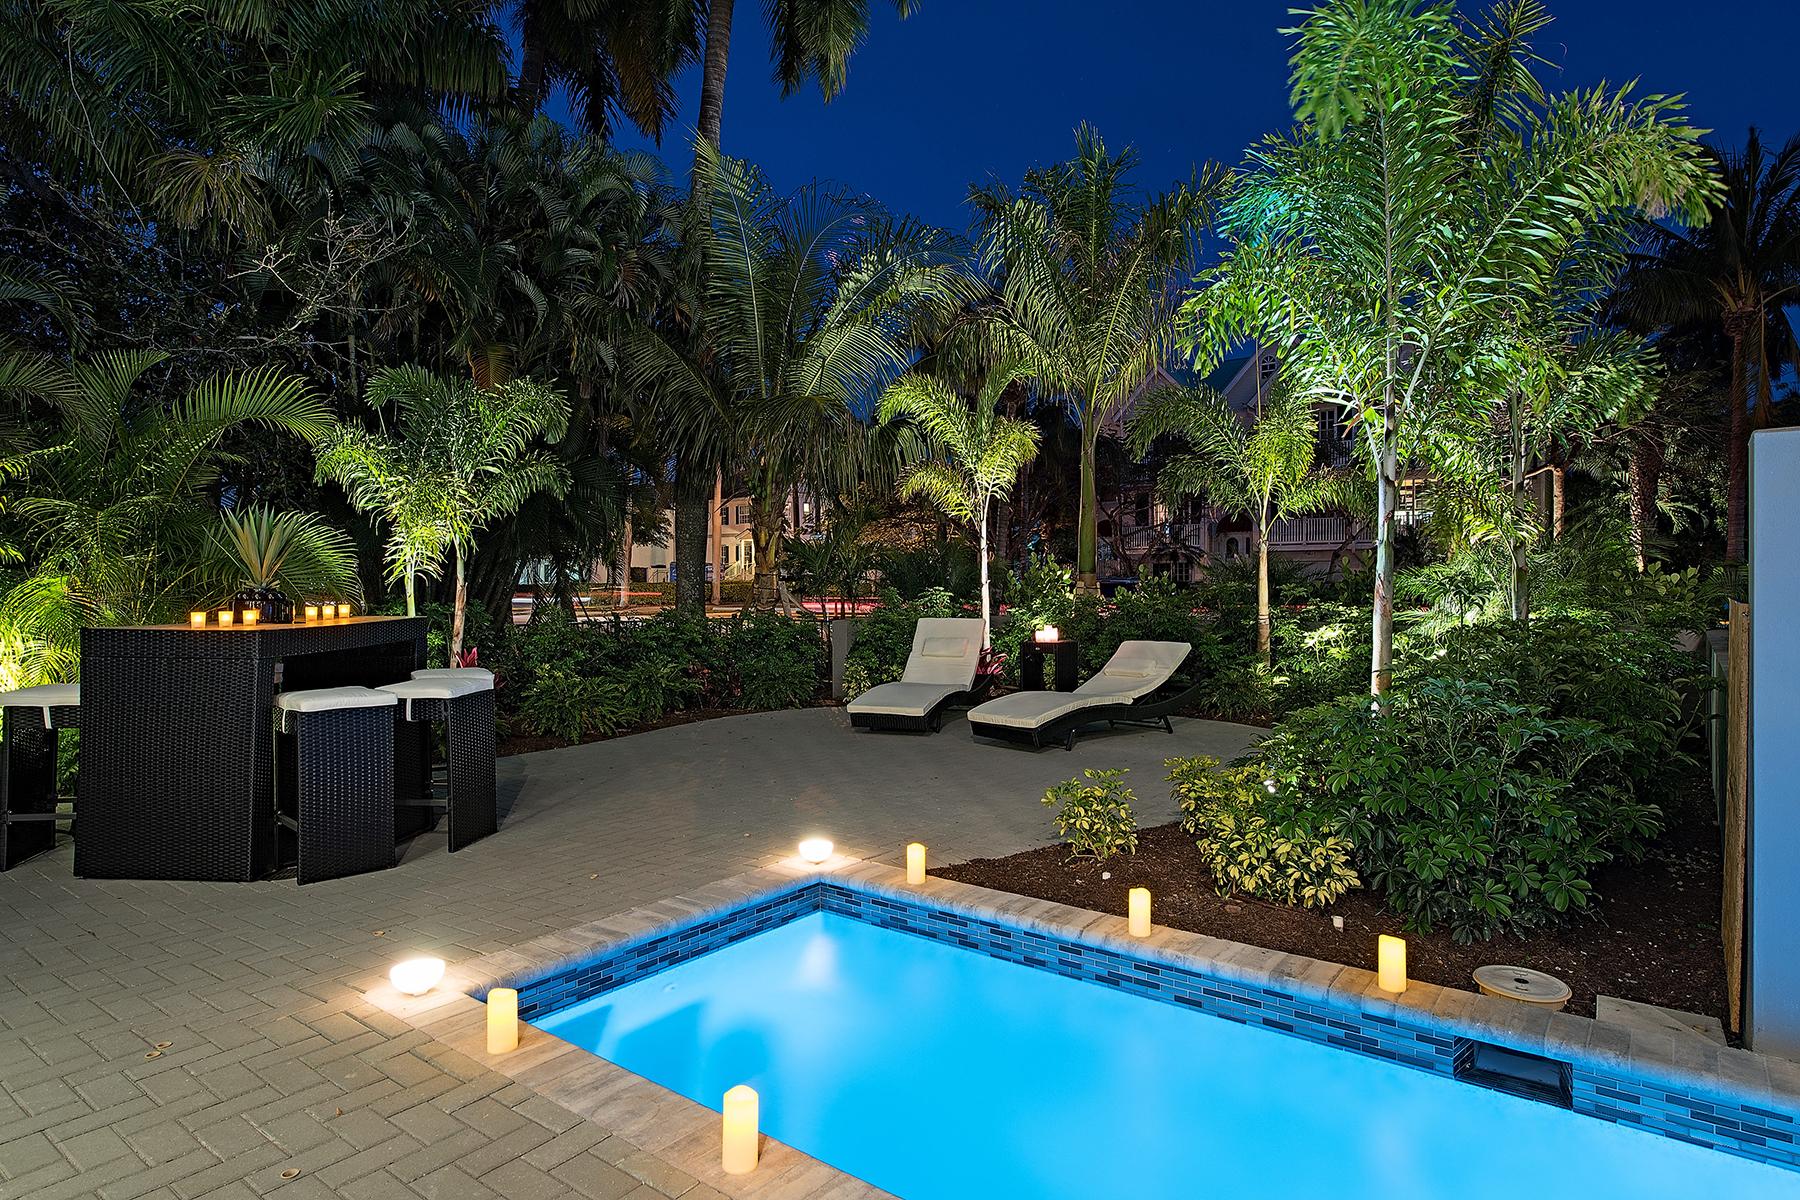 Condominium for Sale at OLD NAPLES - ESMERALDA ON EIGHTH 985 8th Ave S 202, Naples, Florida 34102 United States